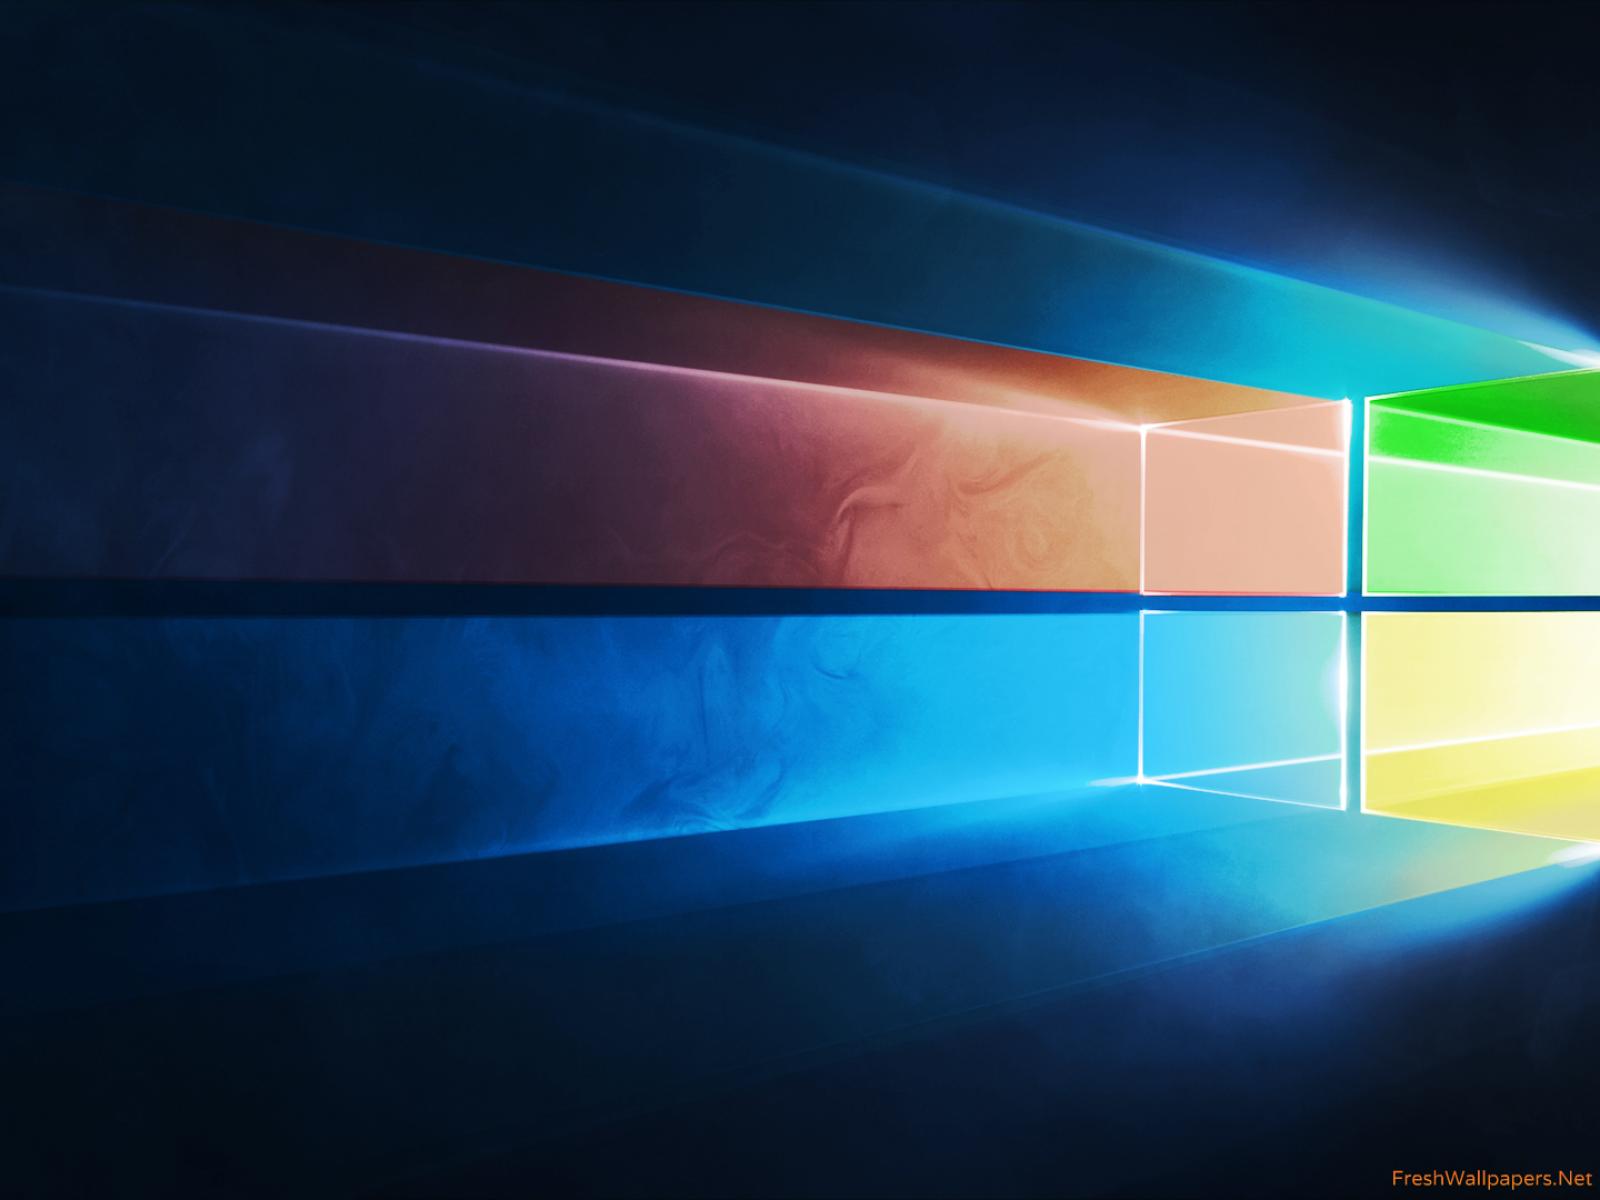 Windows 10 1080p Wallpapers Wallpaper HD Desktop 1600x1200